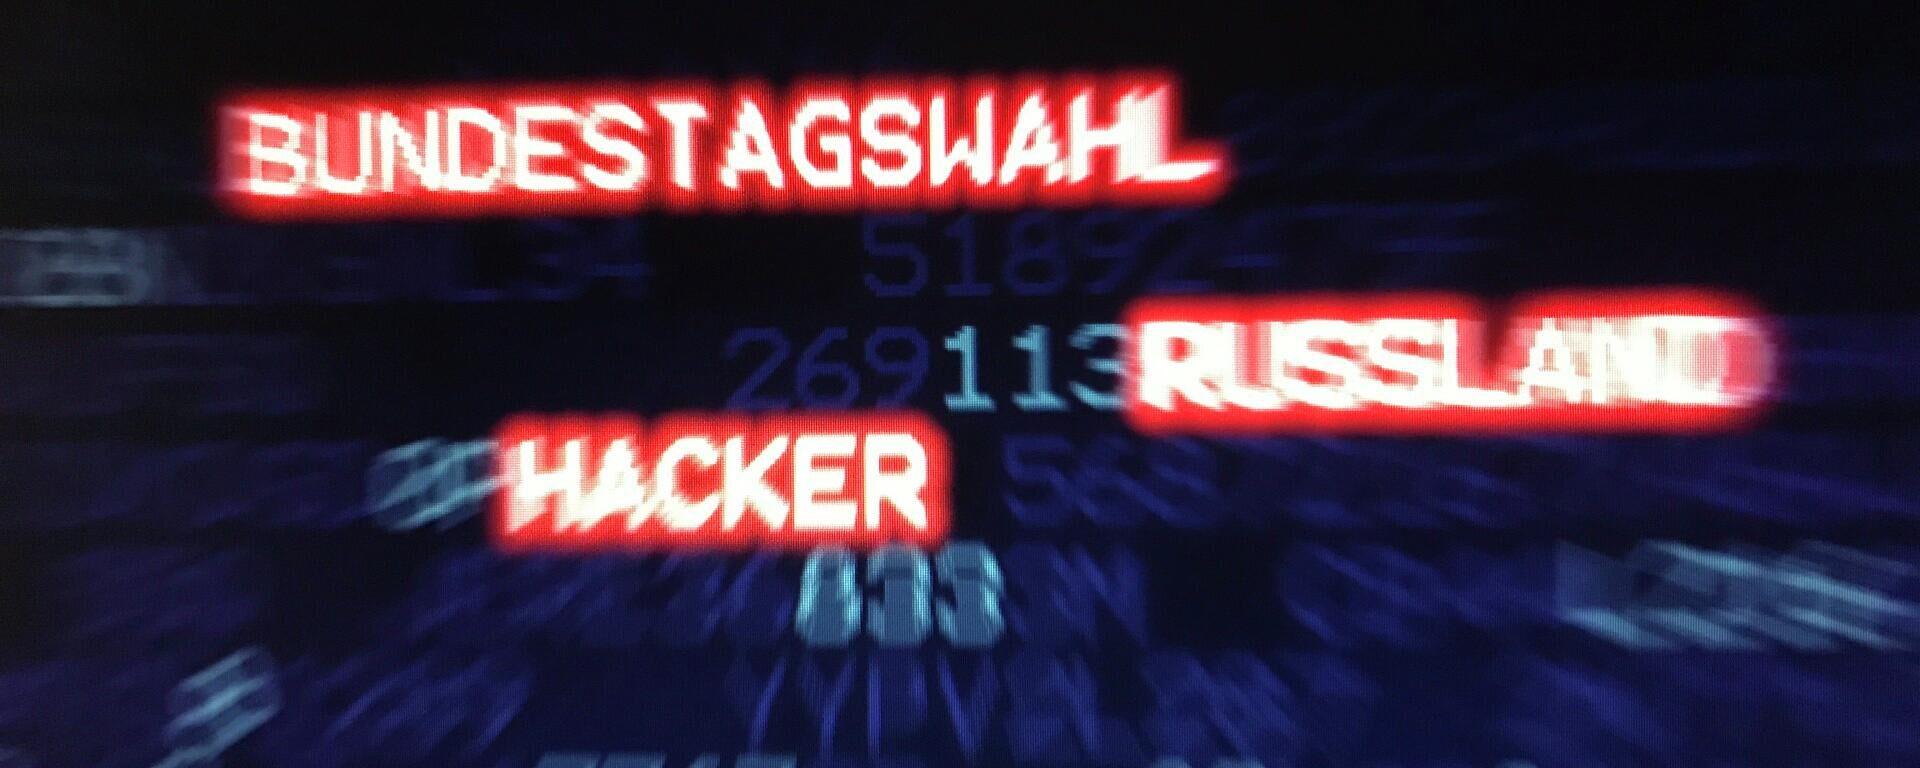 Hackerangriff (Symbolbild) - SNA, 1920, 24.09.2021